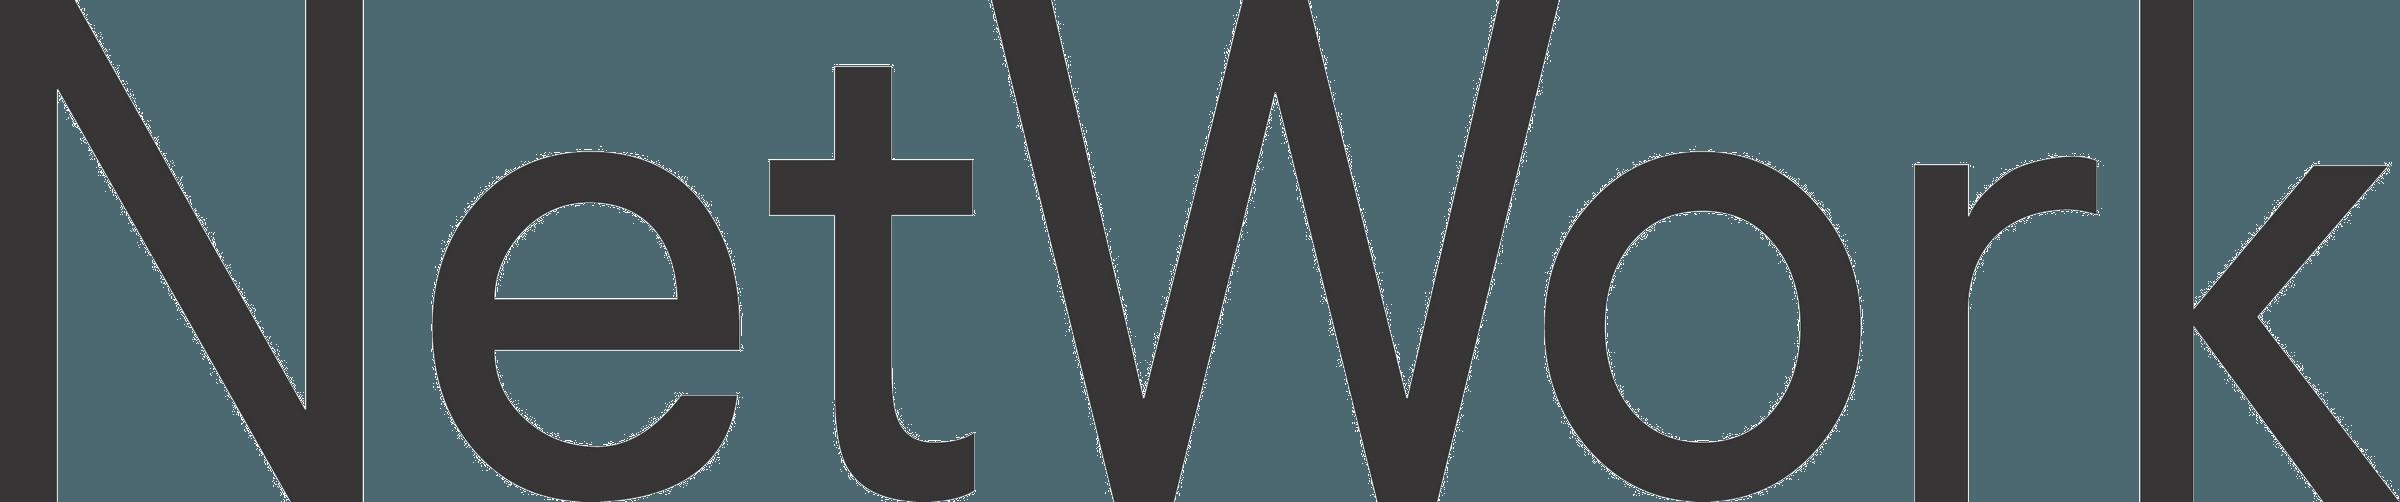 Network Logo [network.com.tr] png